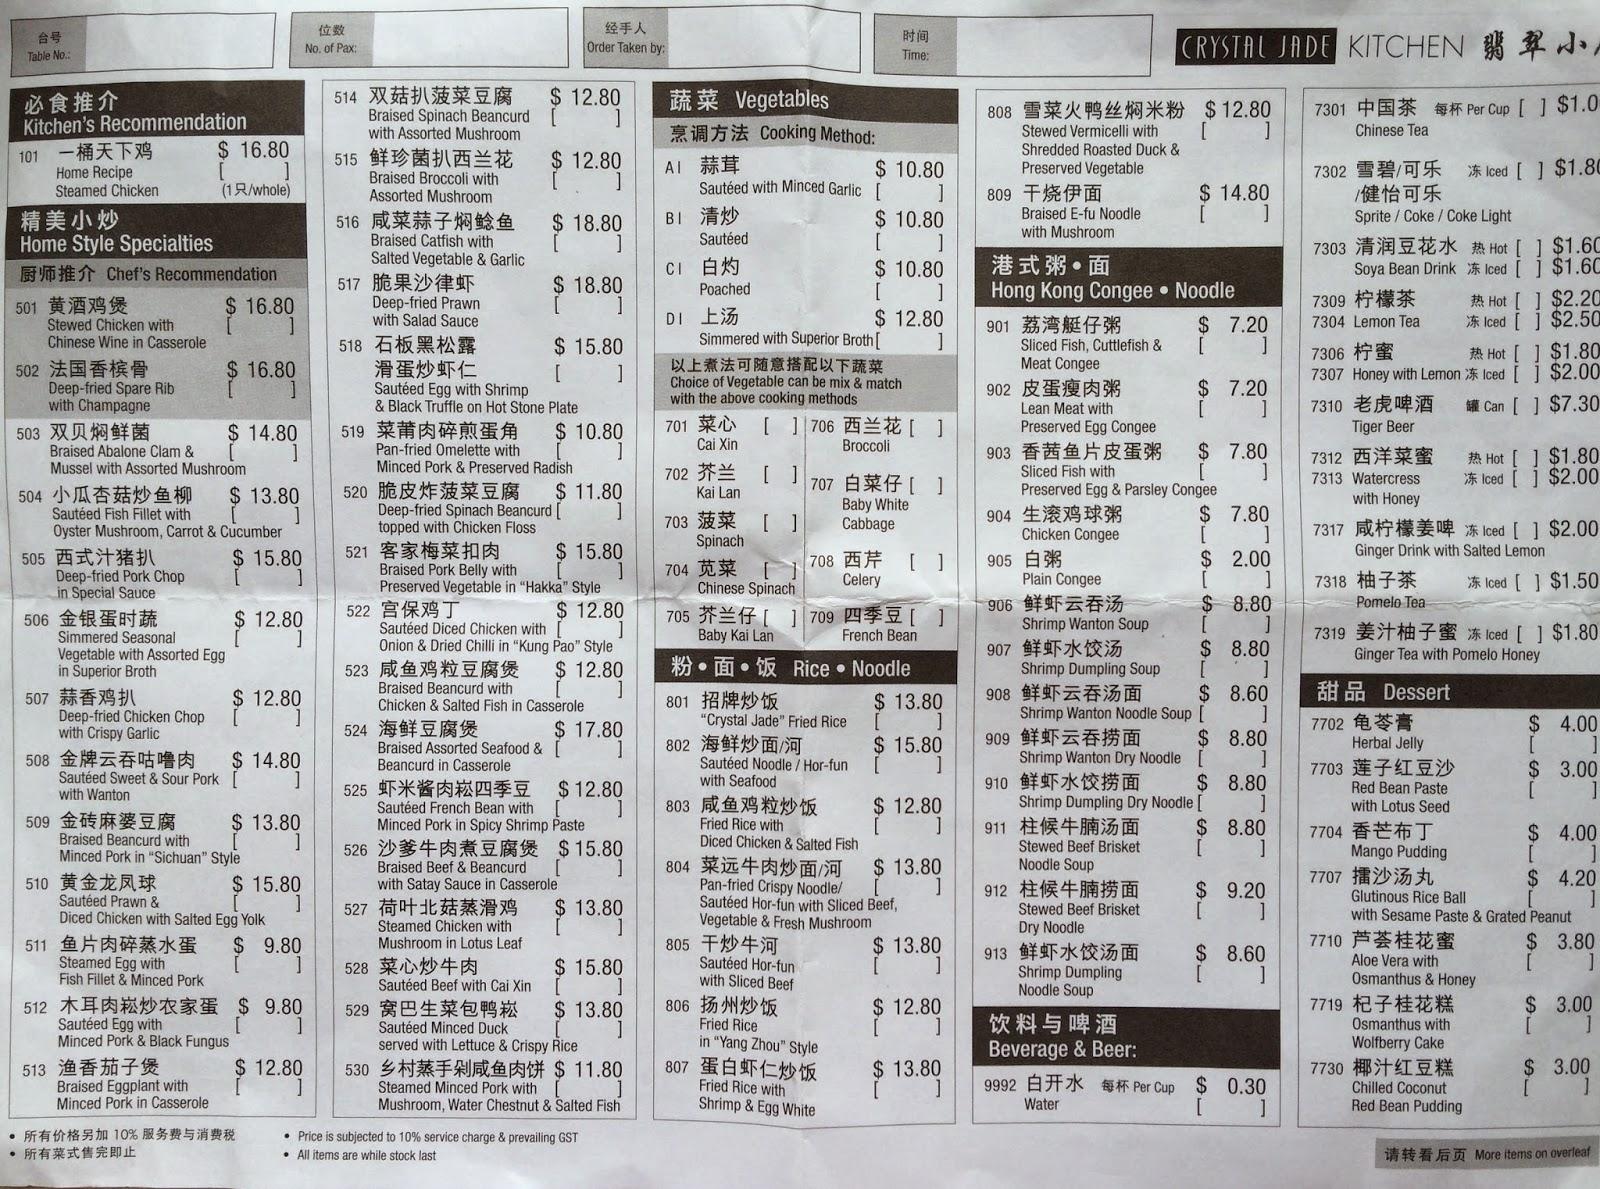 Hungry Ghost Crystal Jade Palace Restaurant Takashimaya